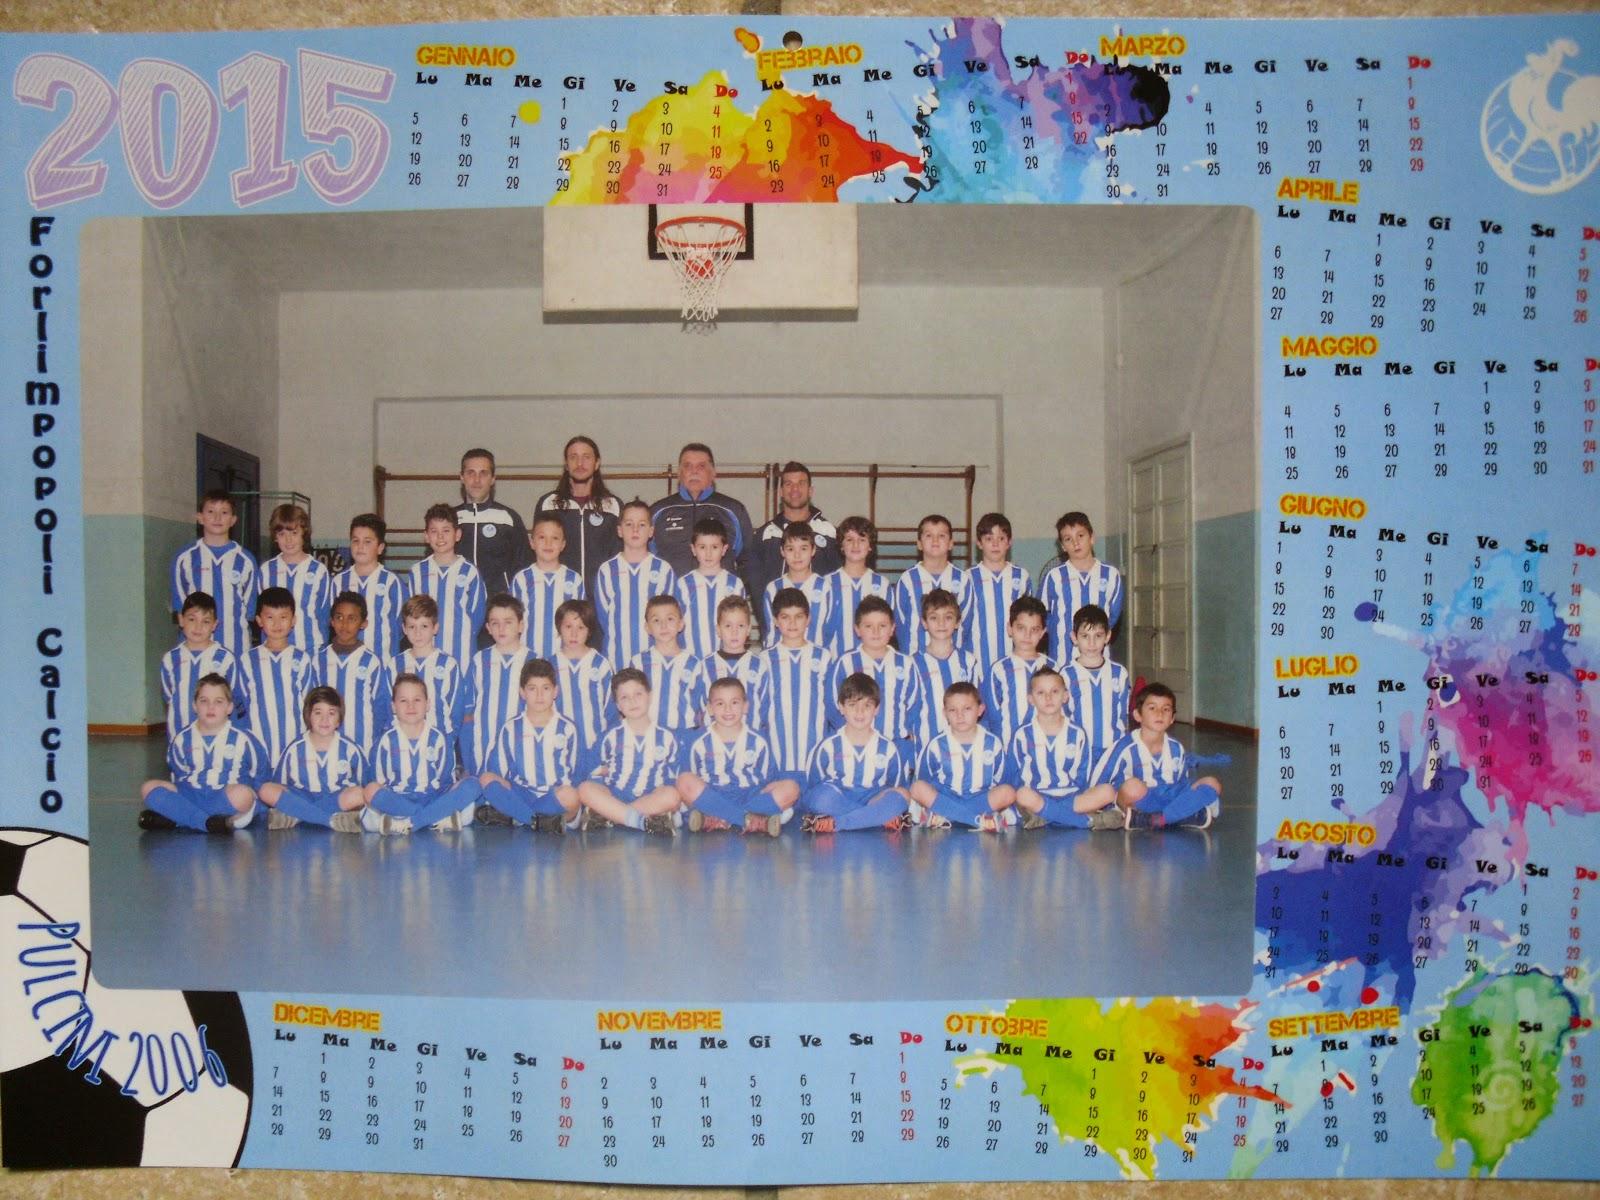 Calendario Pulcini 2006.I Pulcini Di Buva Calendario 2015 Forlimpopoli Calcio 1928